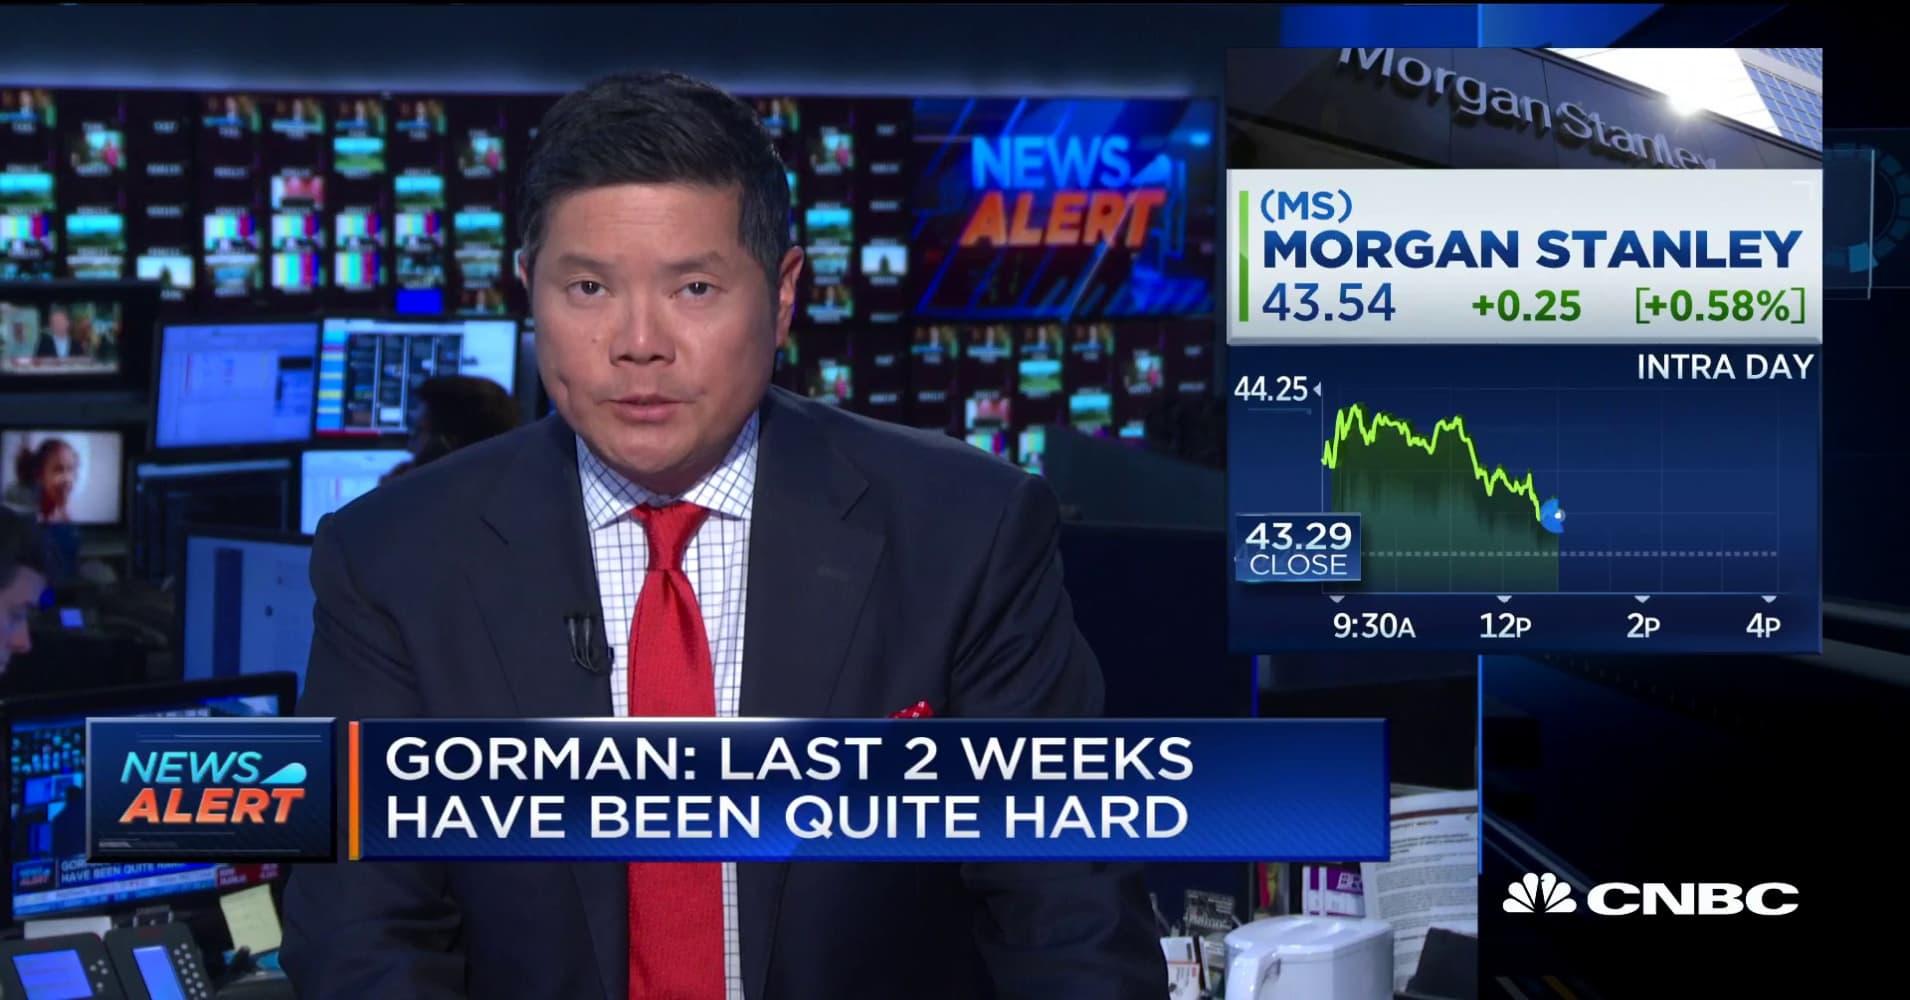 Morgan Stanley CEO: A recession could happen if trade war continues